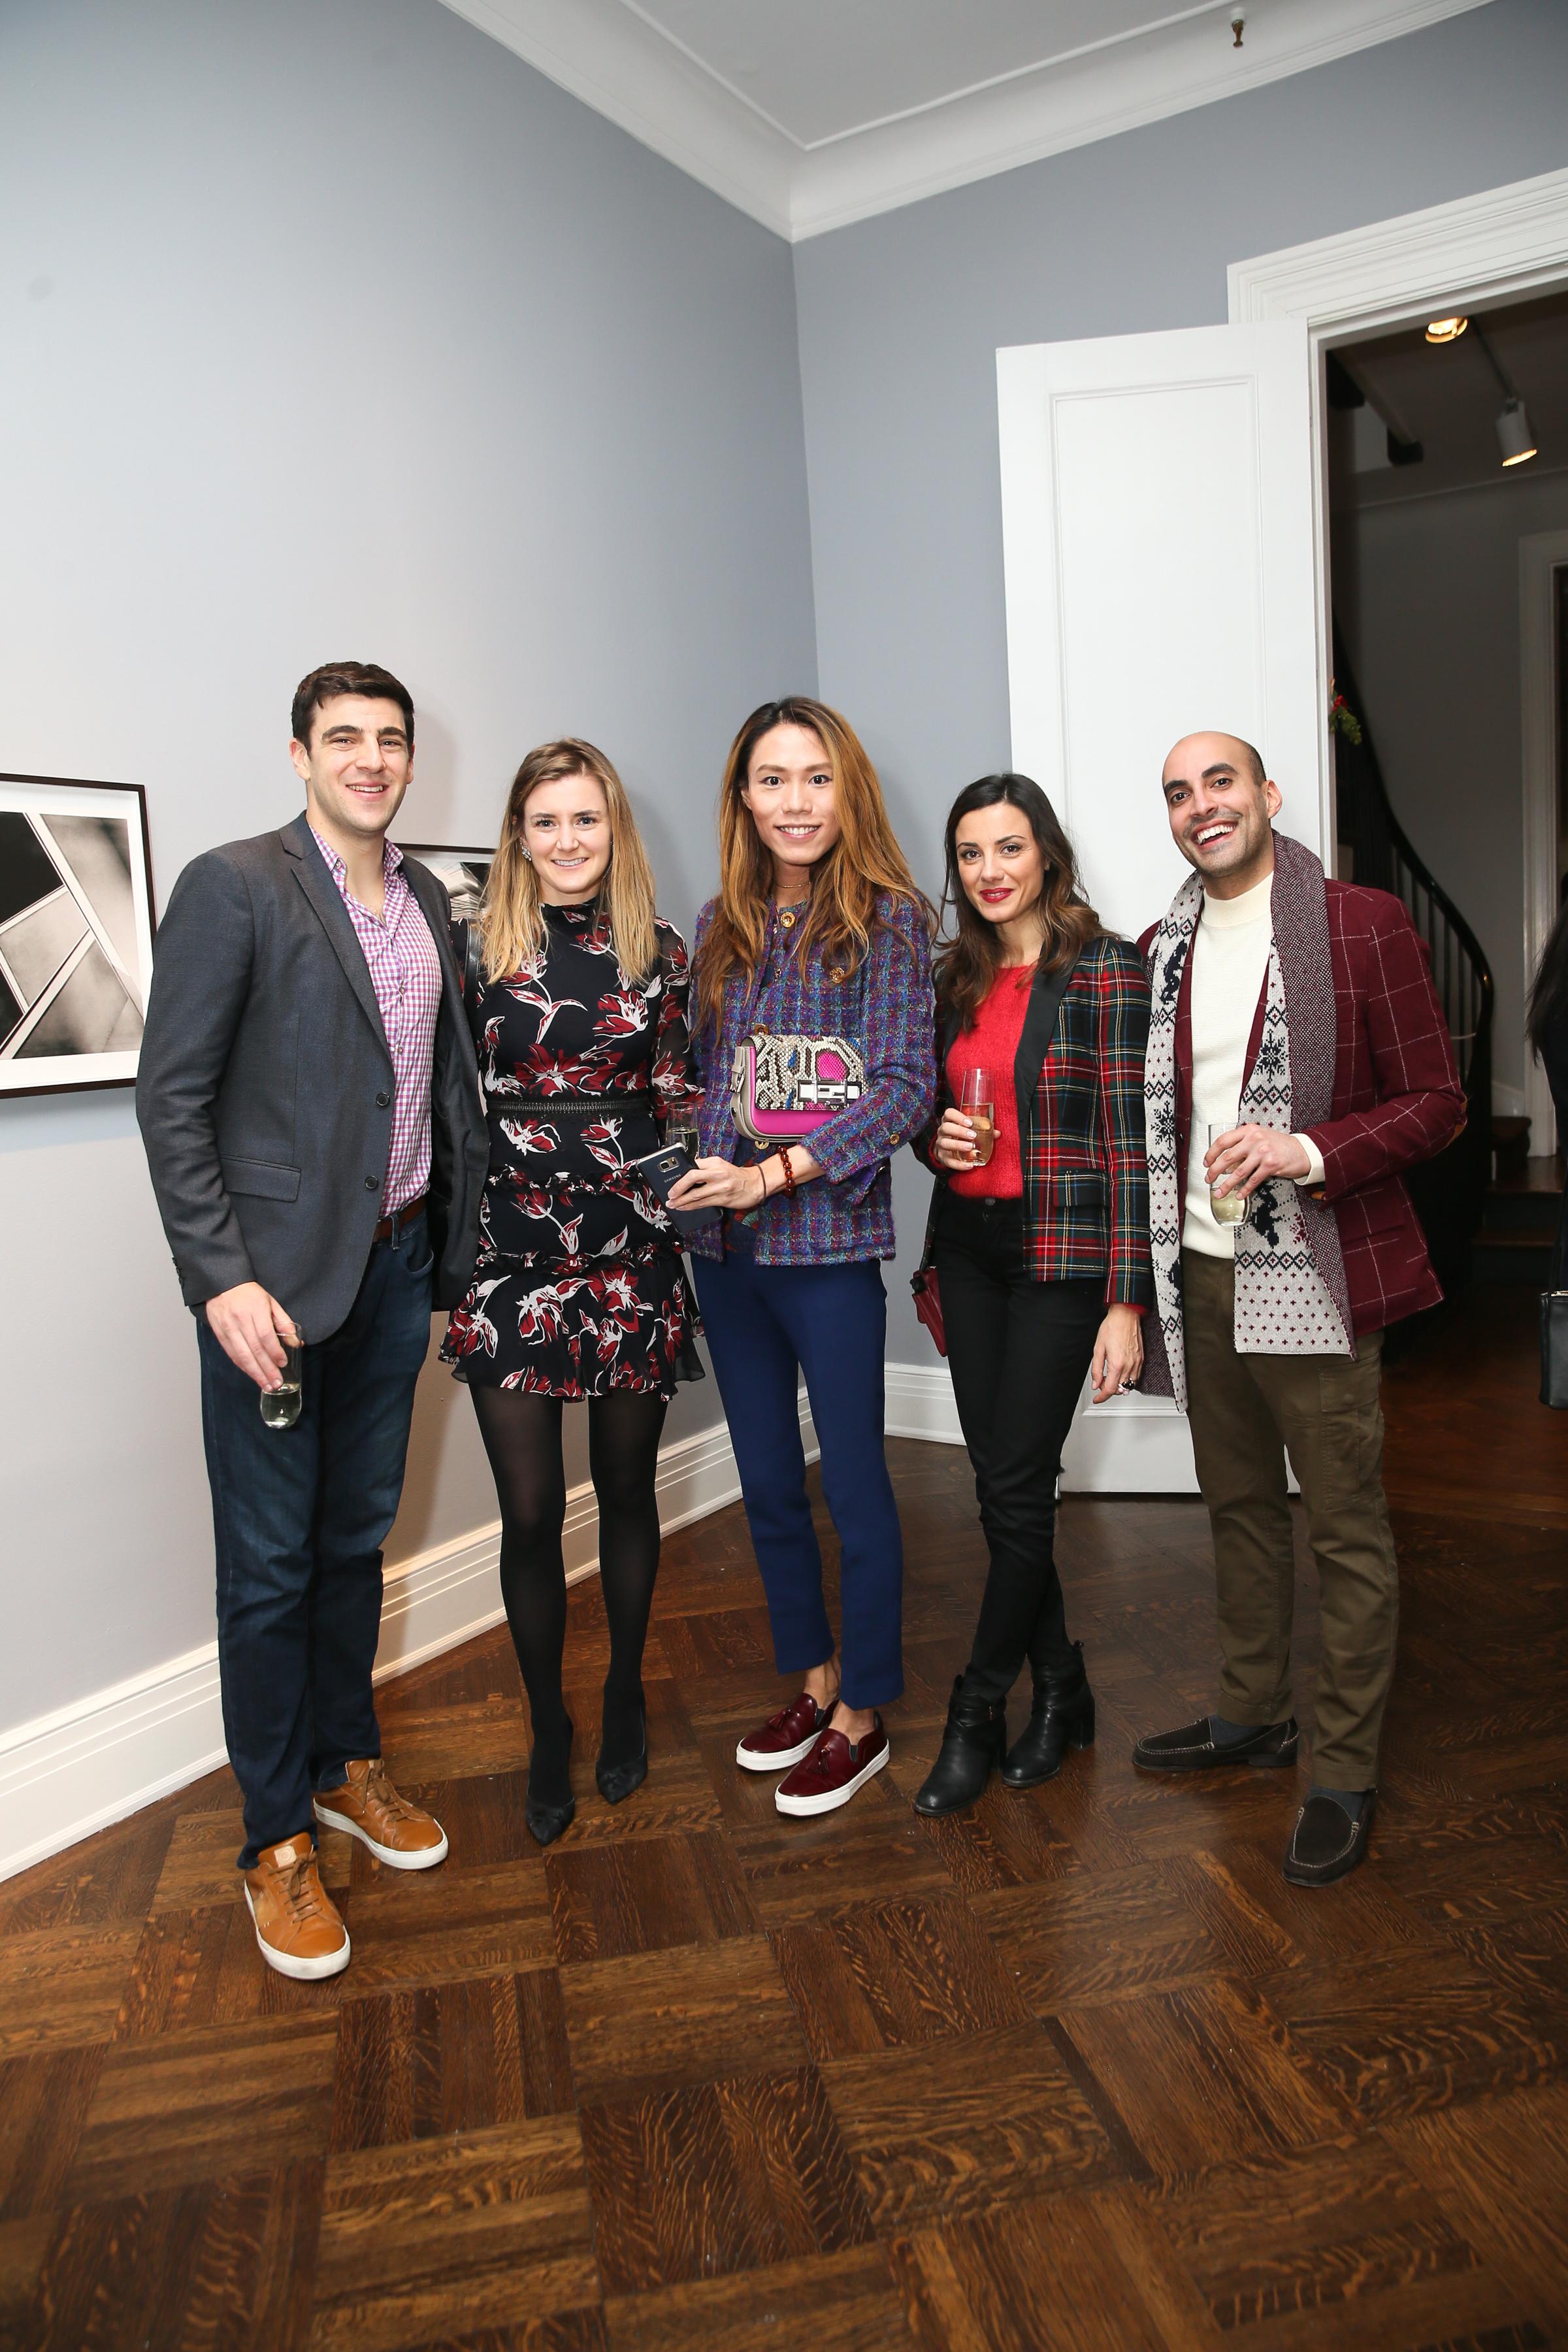 From left: Hal Coopersmith, Flora Irving, Andrew Cheng, Verdiana Patacchini, Matt Vahidi.Photo credit: Noa Griffel for BFA